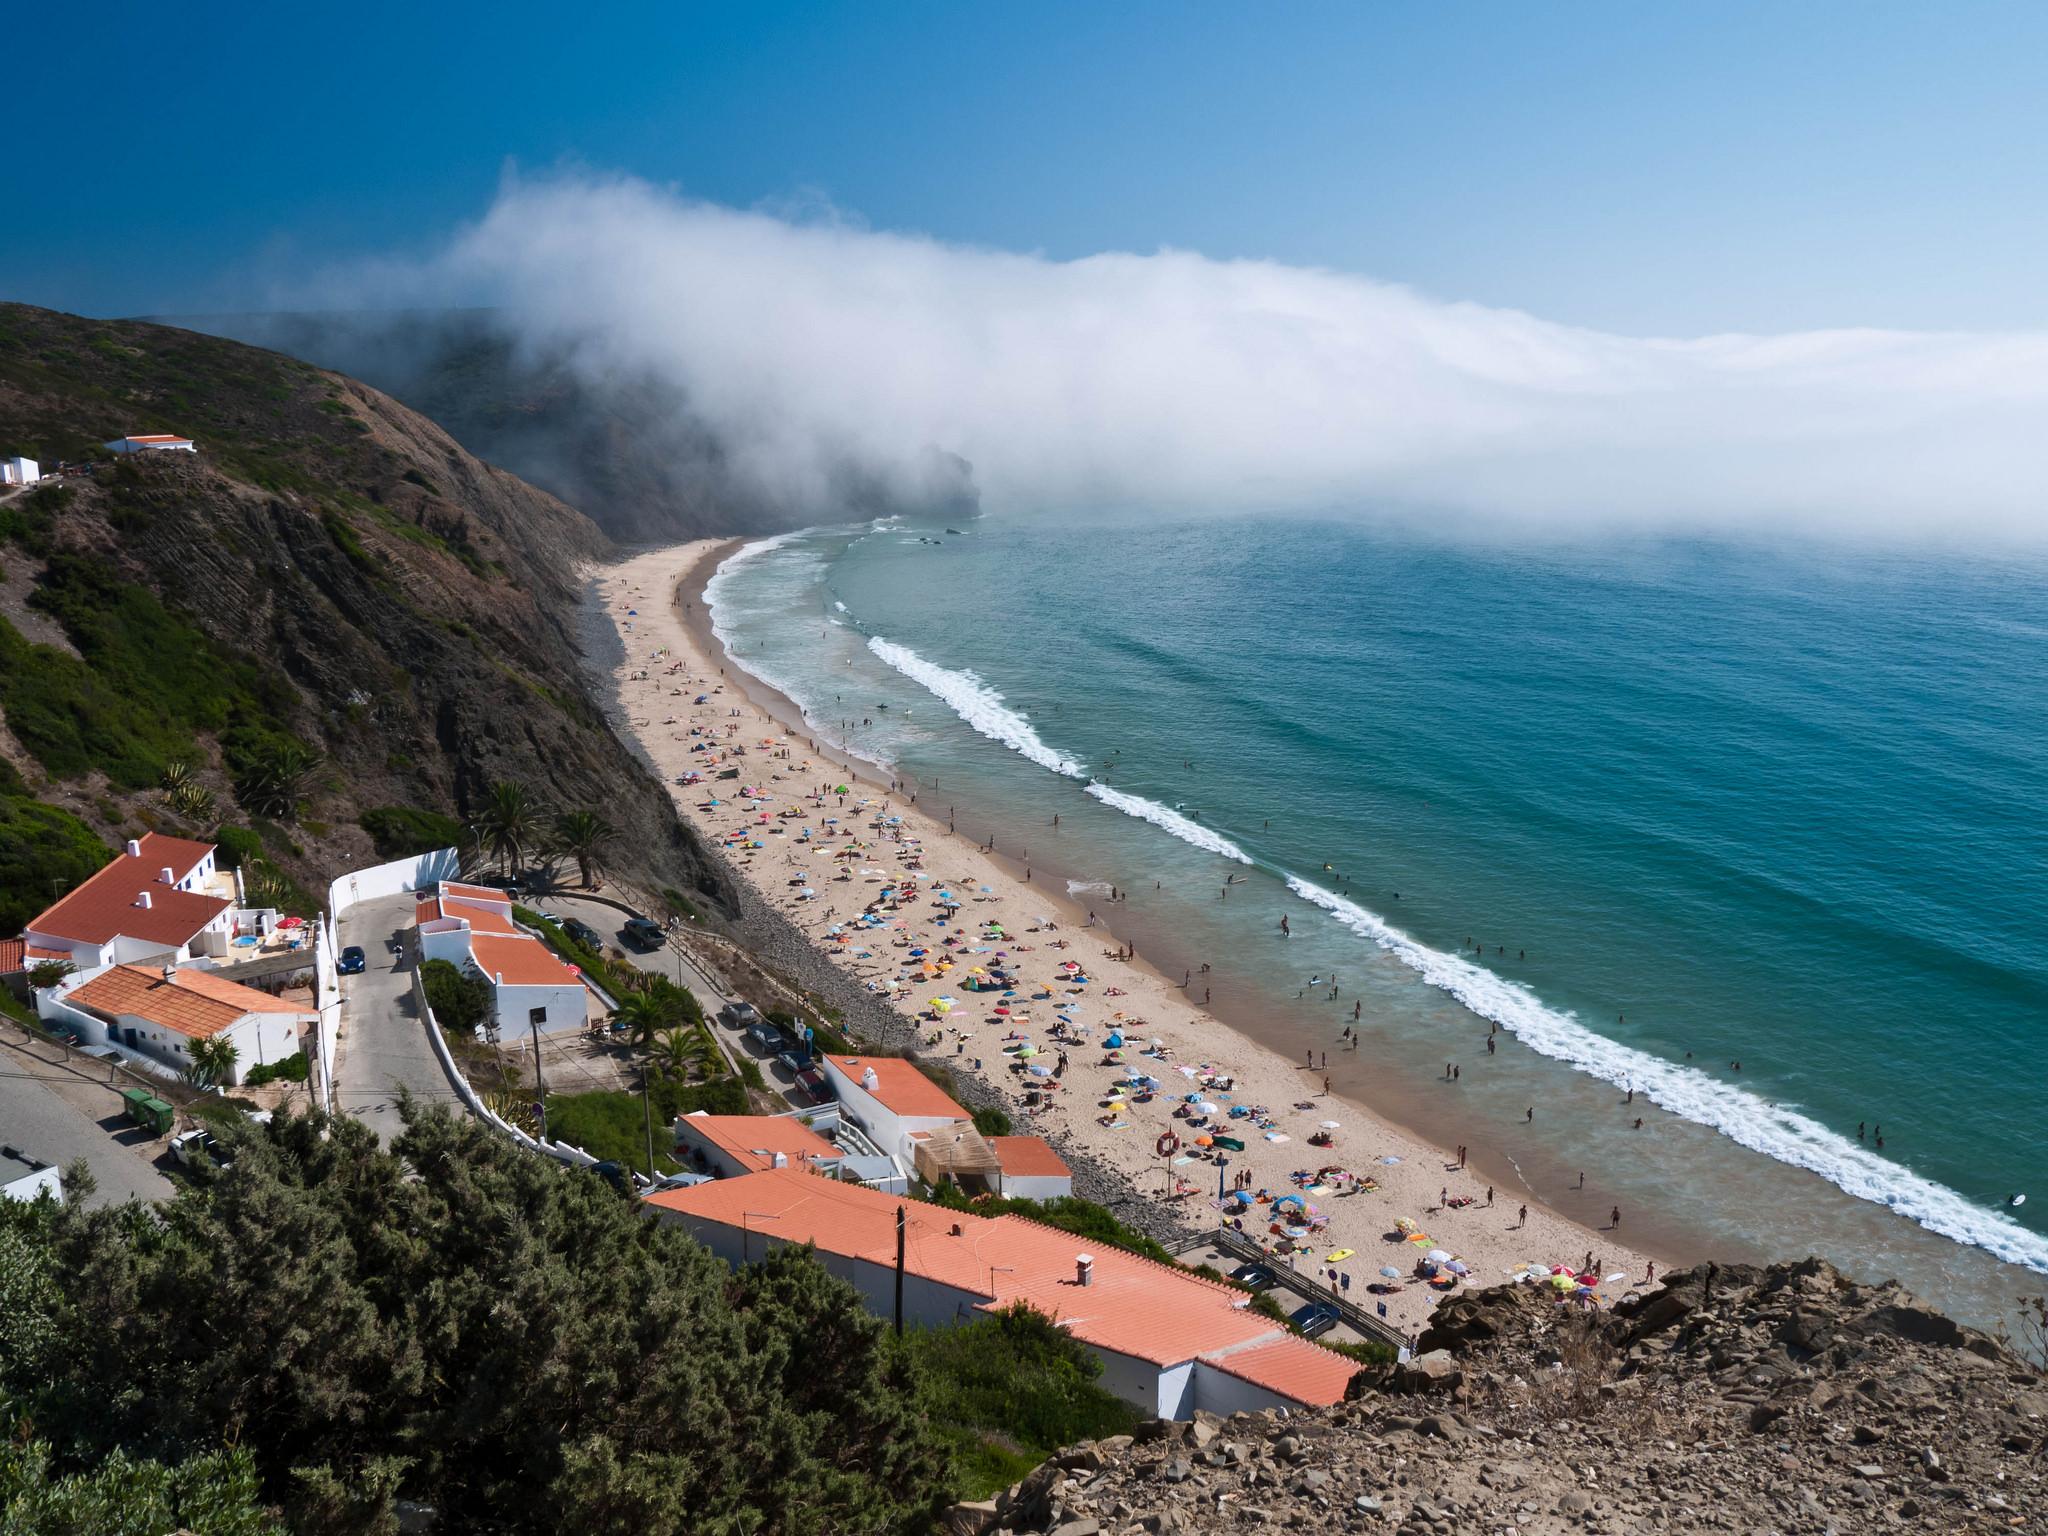 Das Wetter im Januar der Algarve